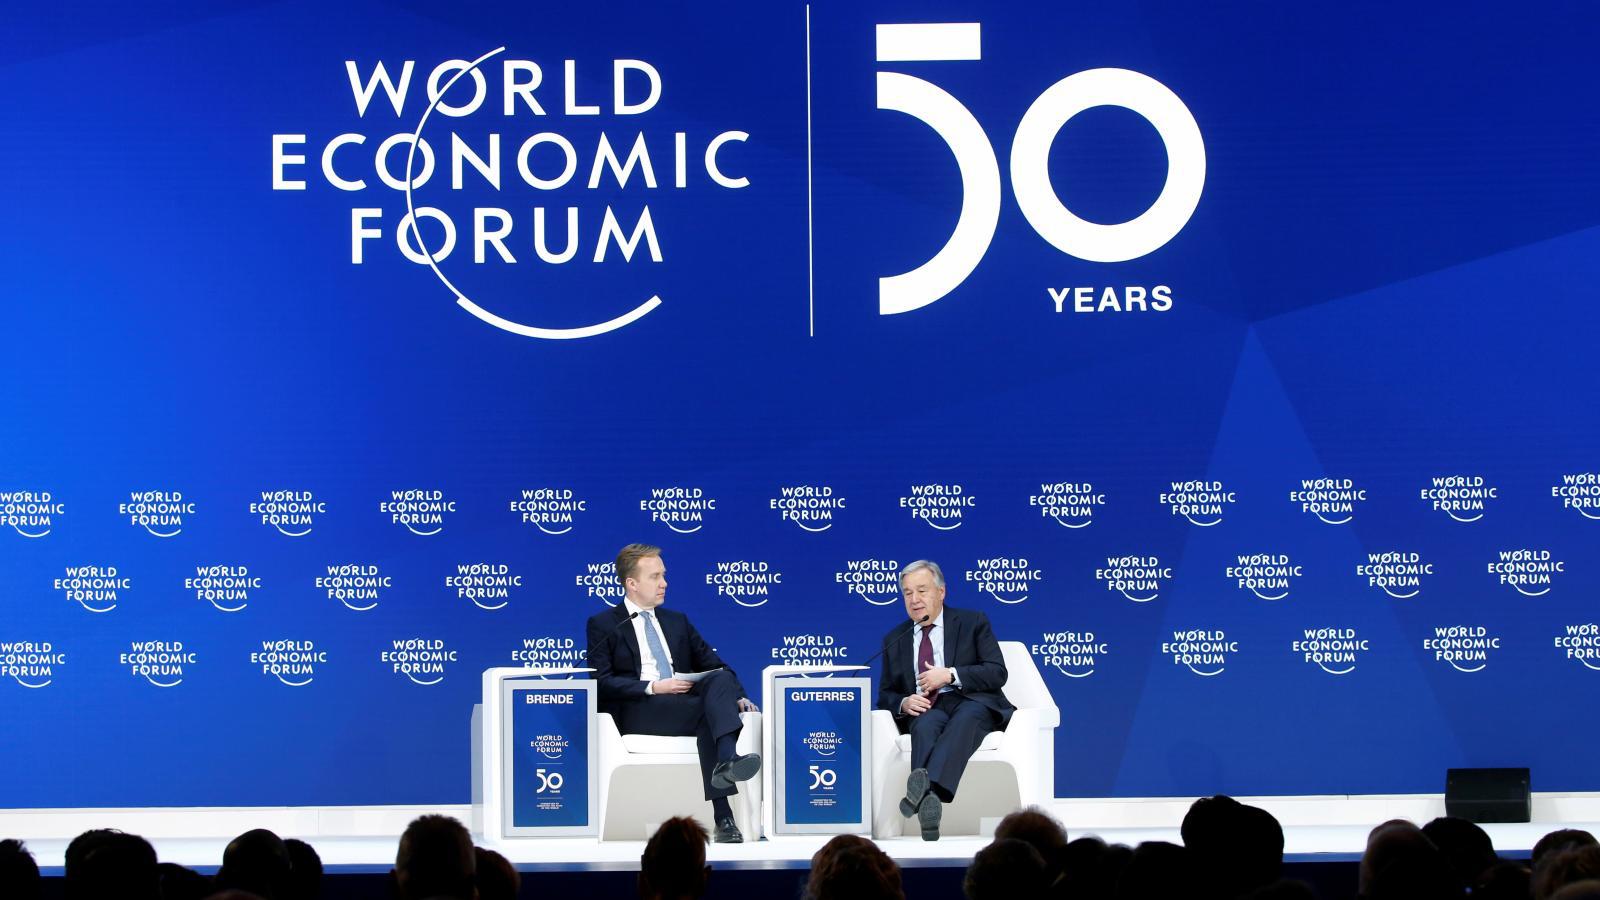 The Davos World Economic Forum